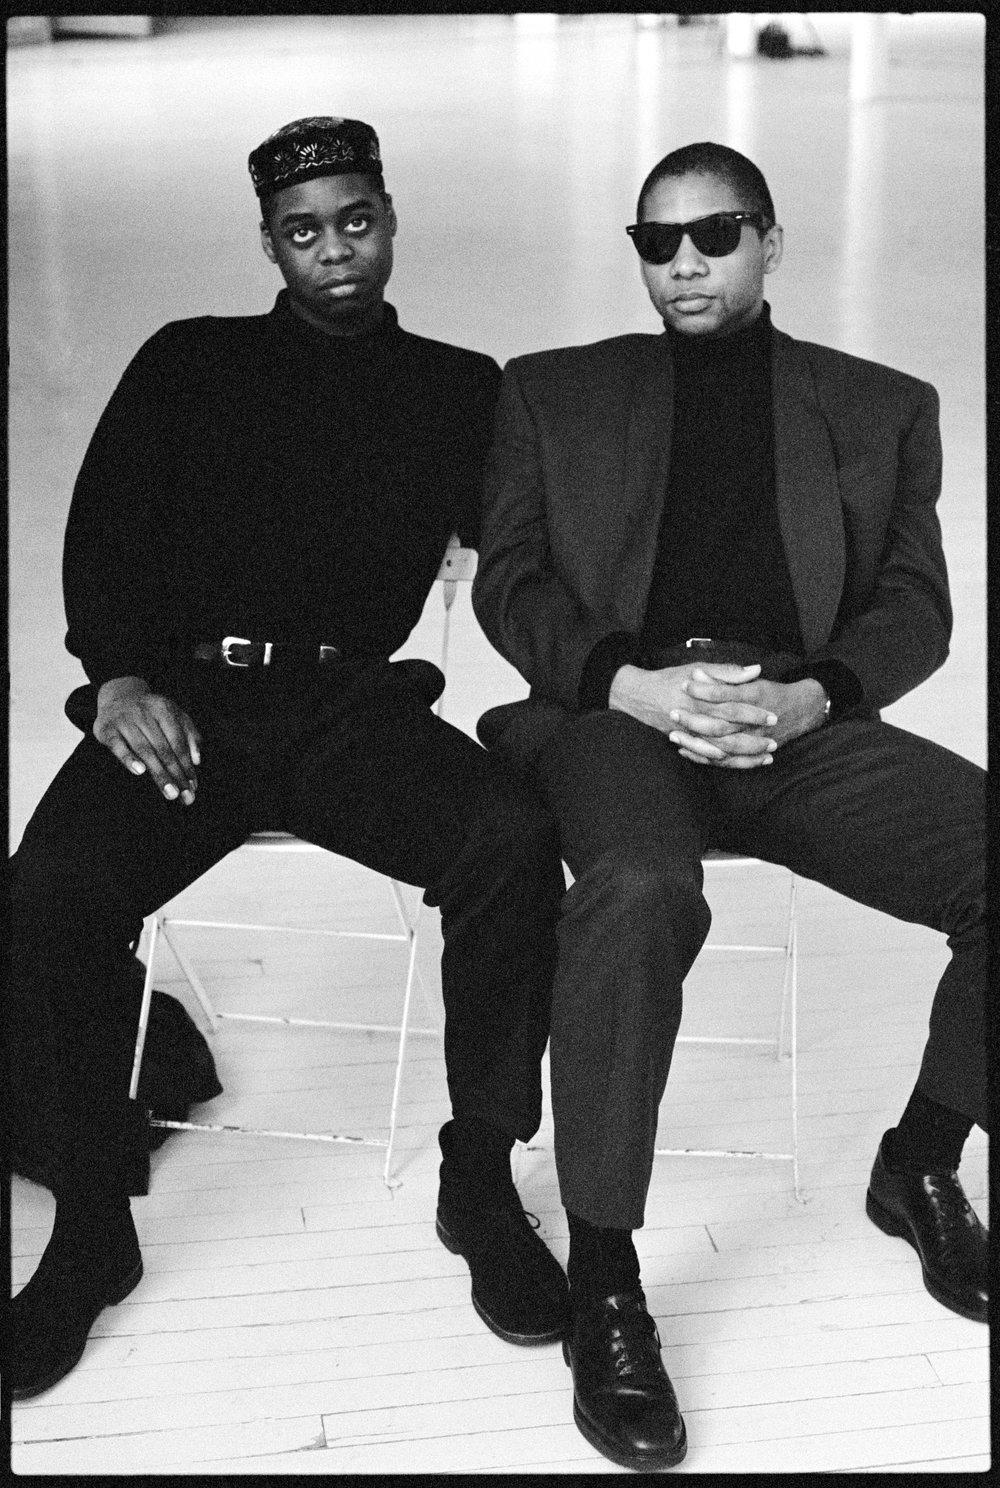 Courtney Pines and Bradford Marsalis, 1990, New York City © Arthur Elgort